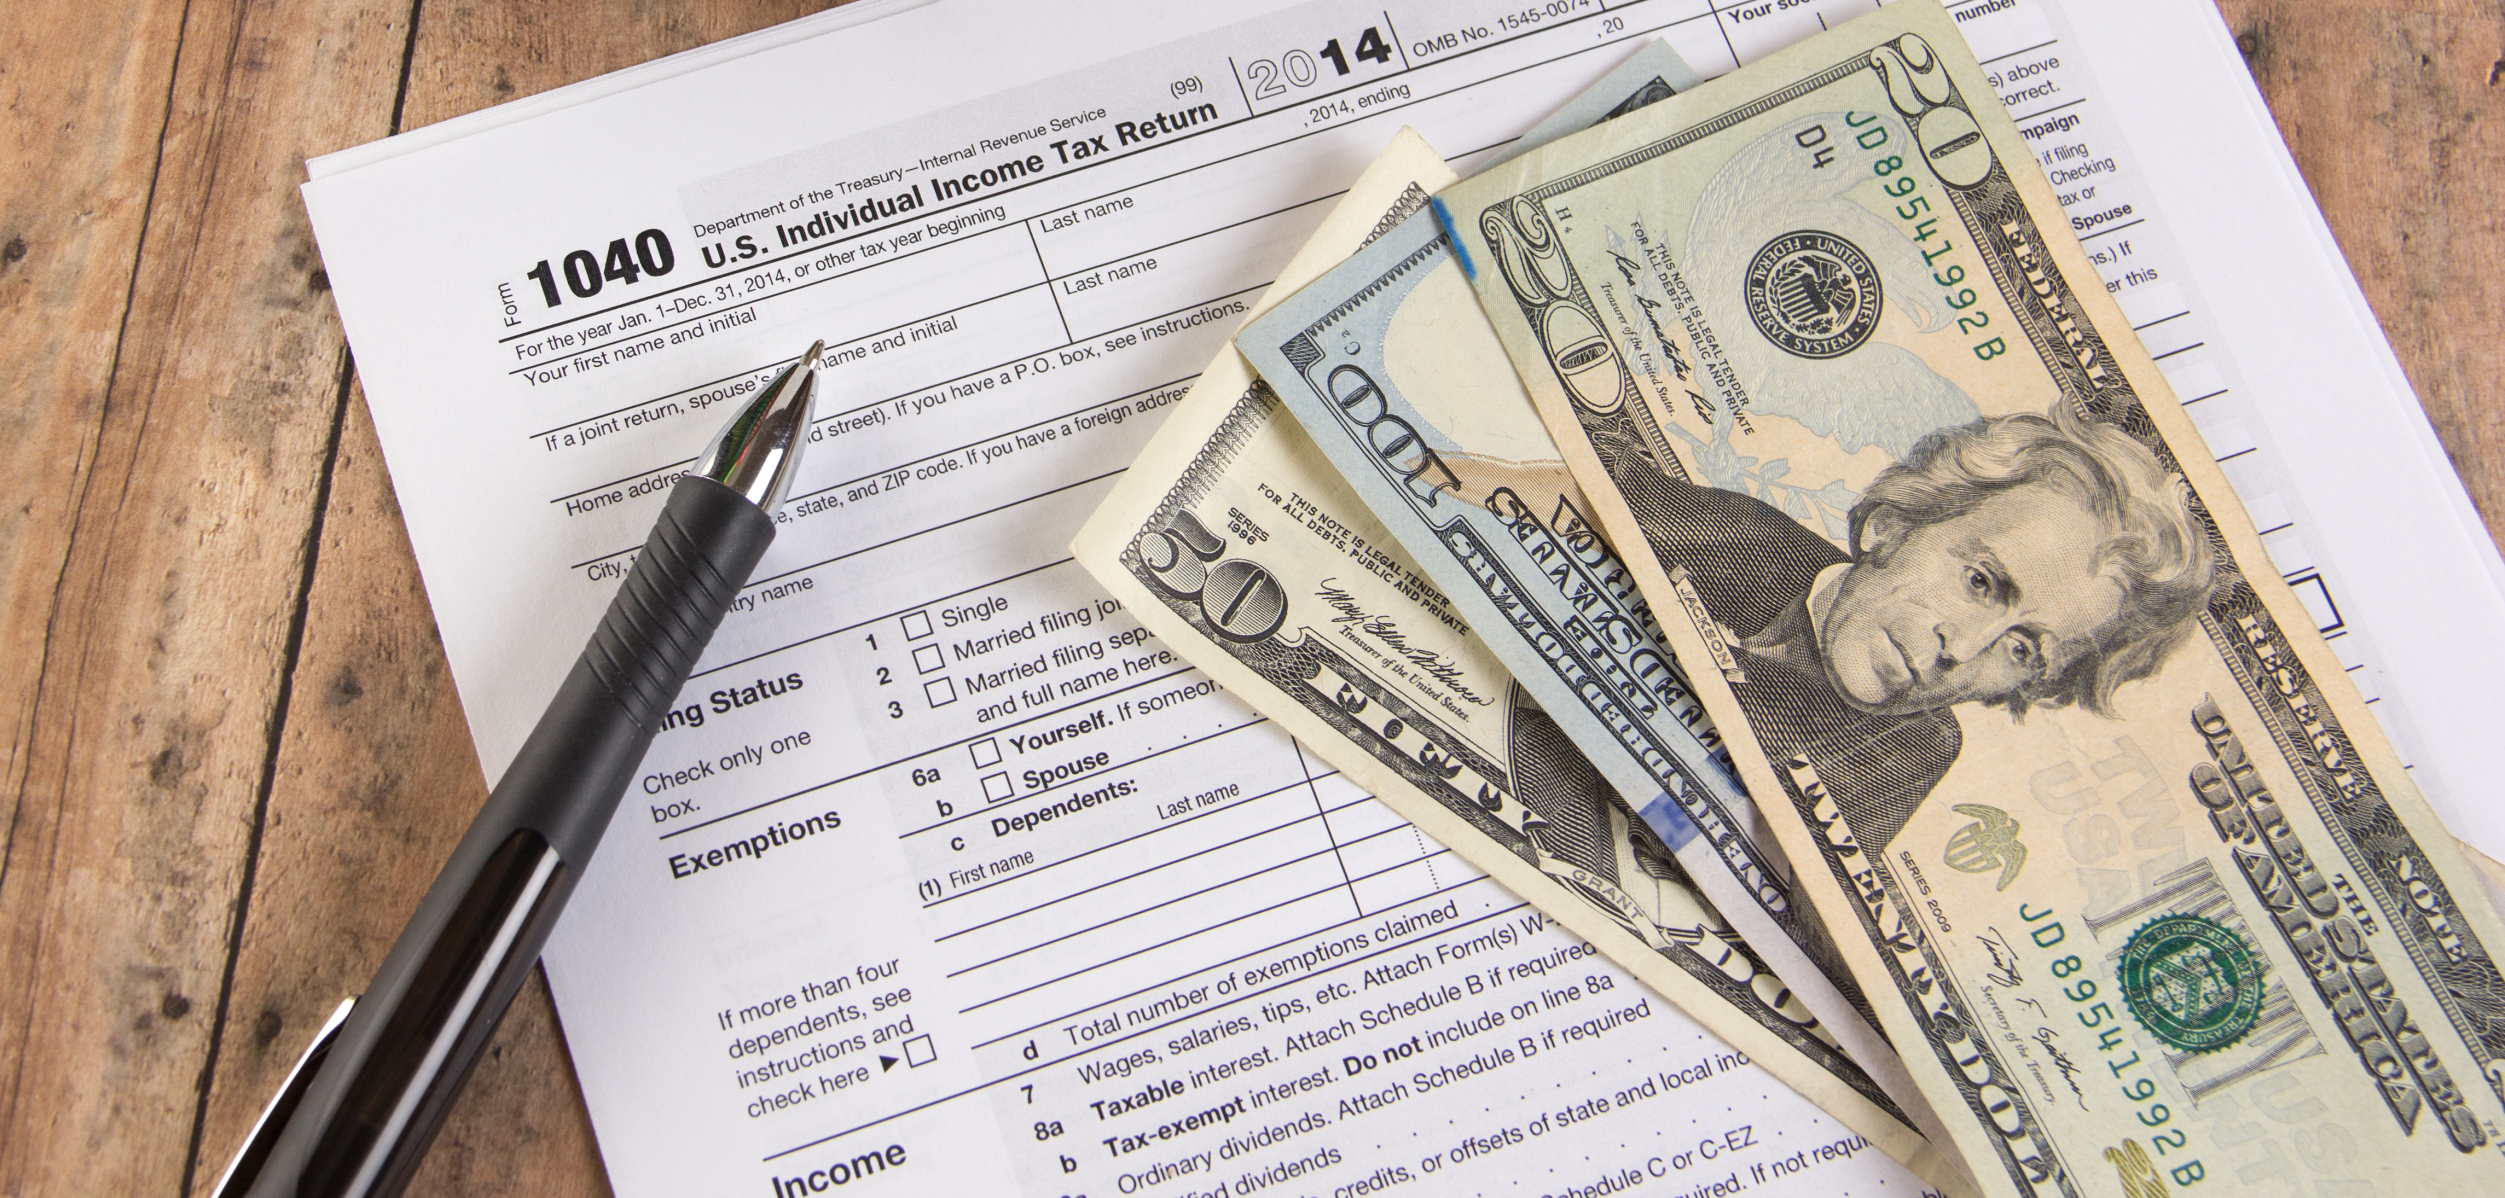 Can I Claim Volunteer Coaching for Tax Purposes? | Pocketsense